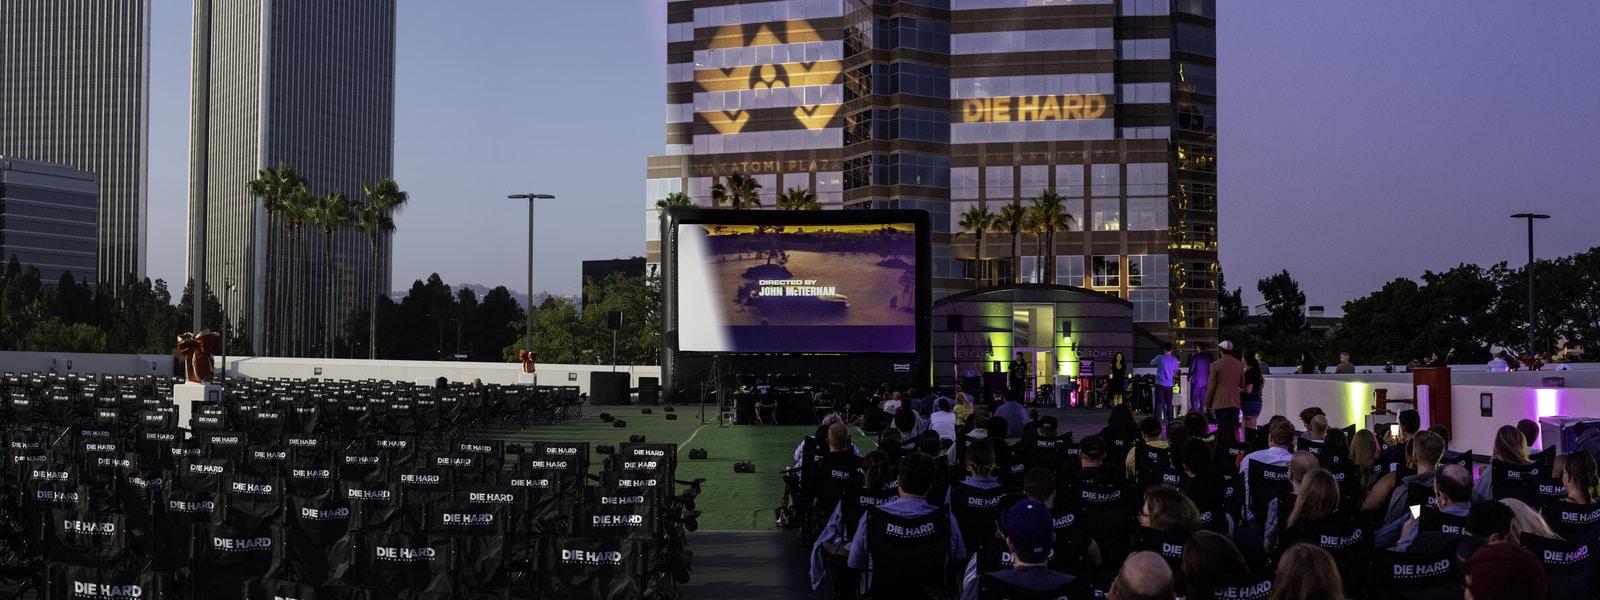 Die Hard Anniversary Screening